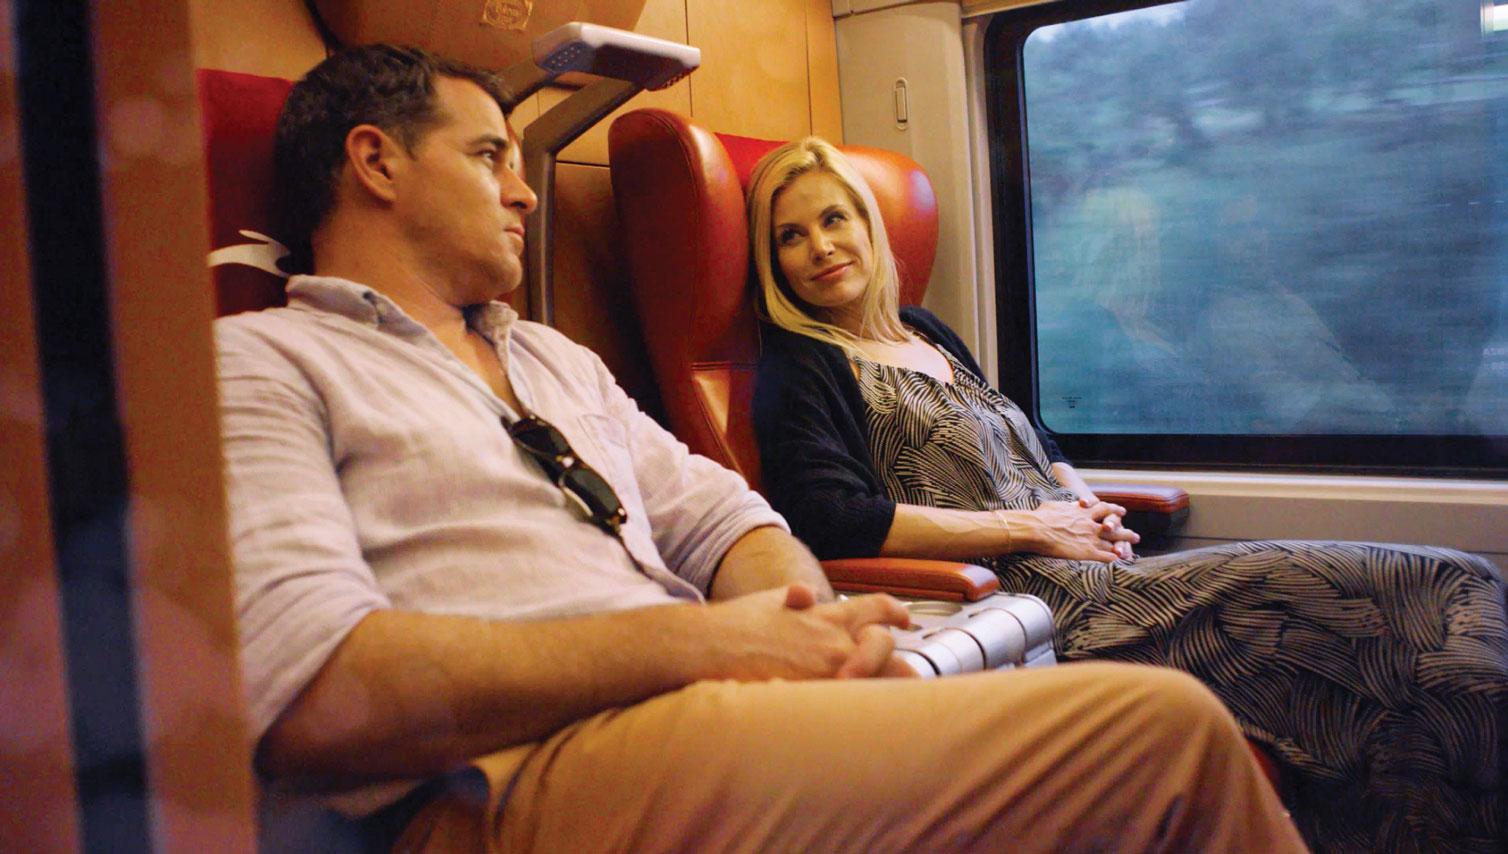 MO-2014-Video-Screen-Shot_Train-Passengers_CXjhm